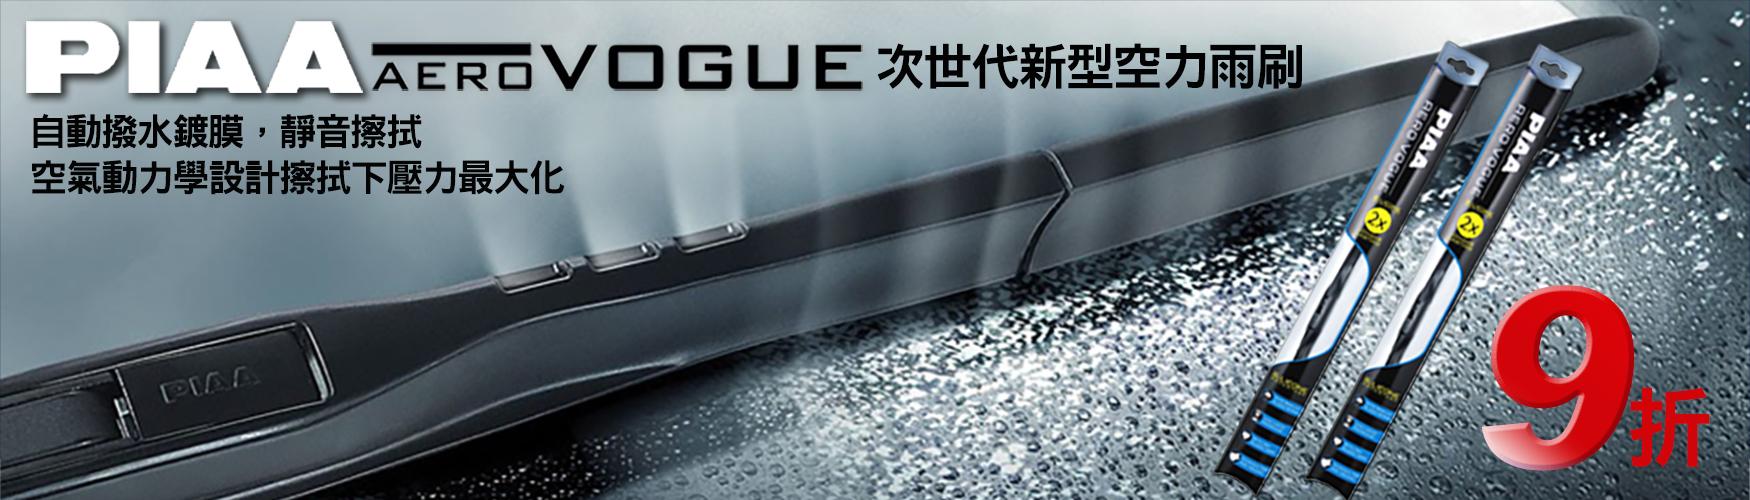 PIAA VOGUE次世代新空力雨刷 9折,自動撥水鍍膜、靜音擦拭,空氣動力學設計擦拭下壓力最大化,更潔淨。